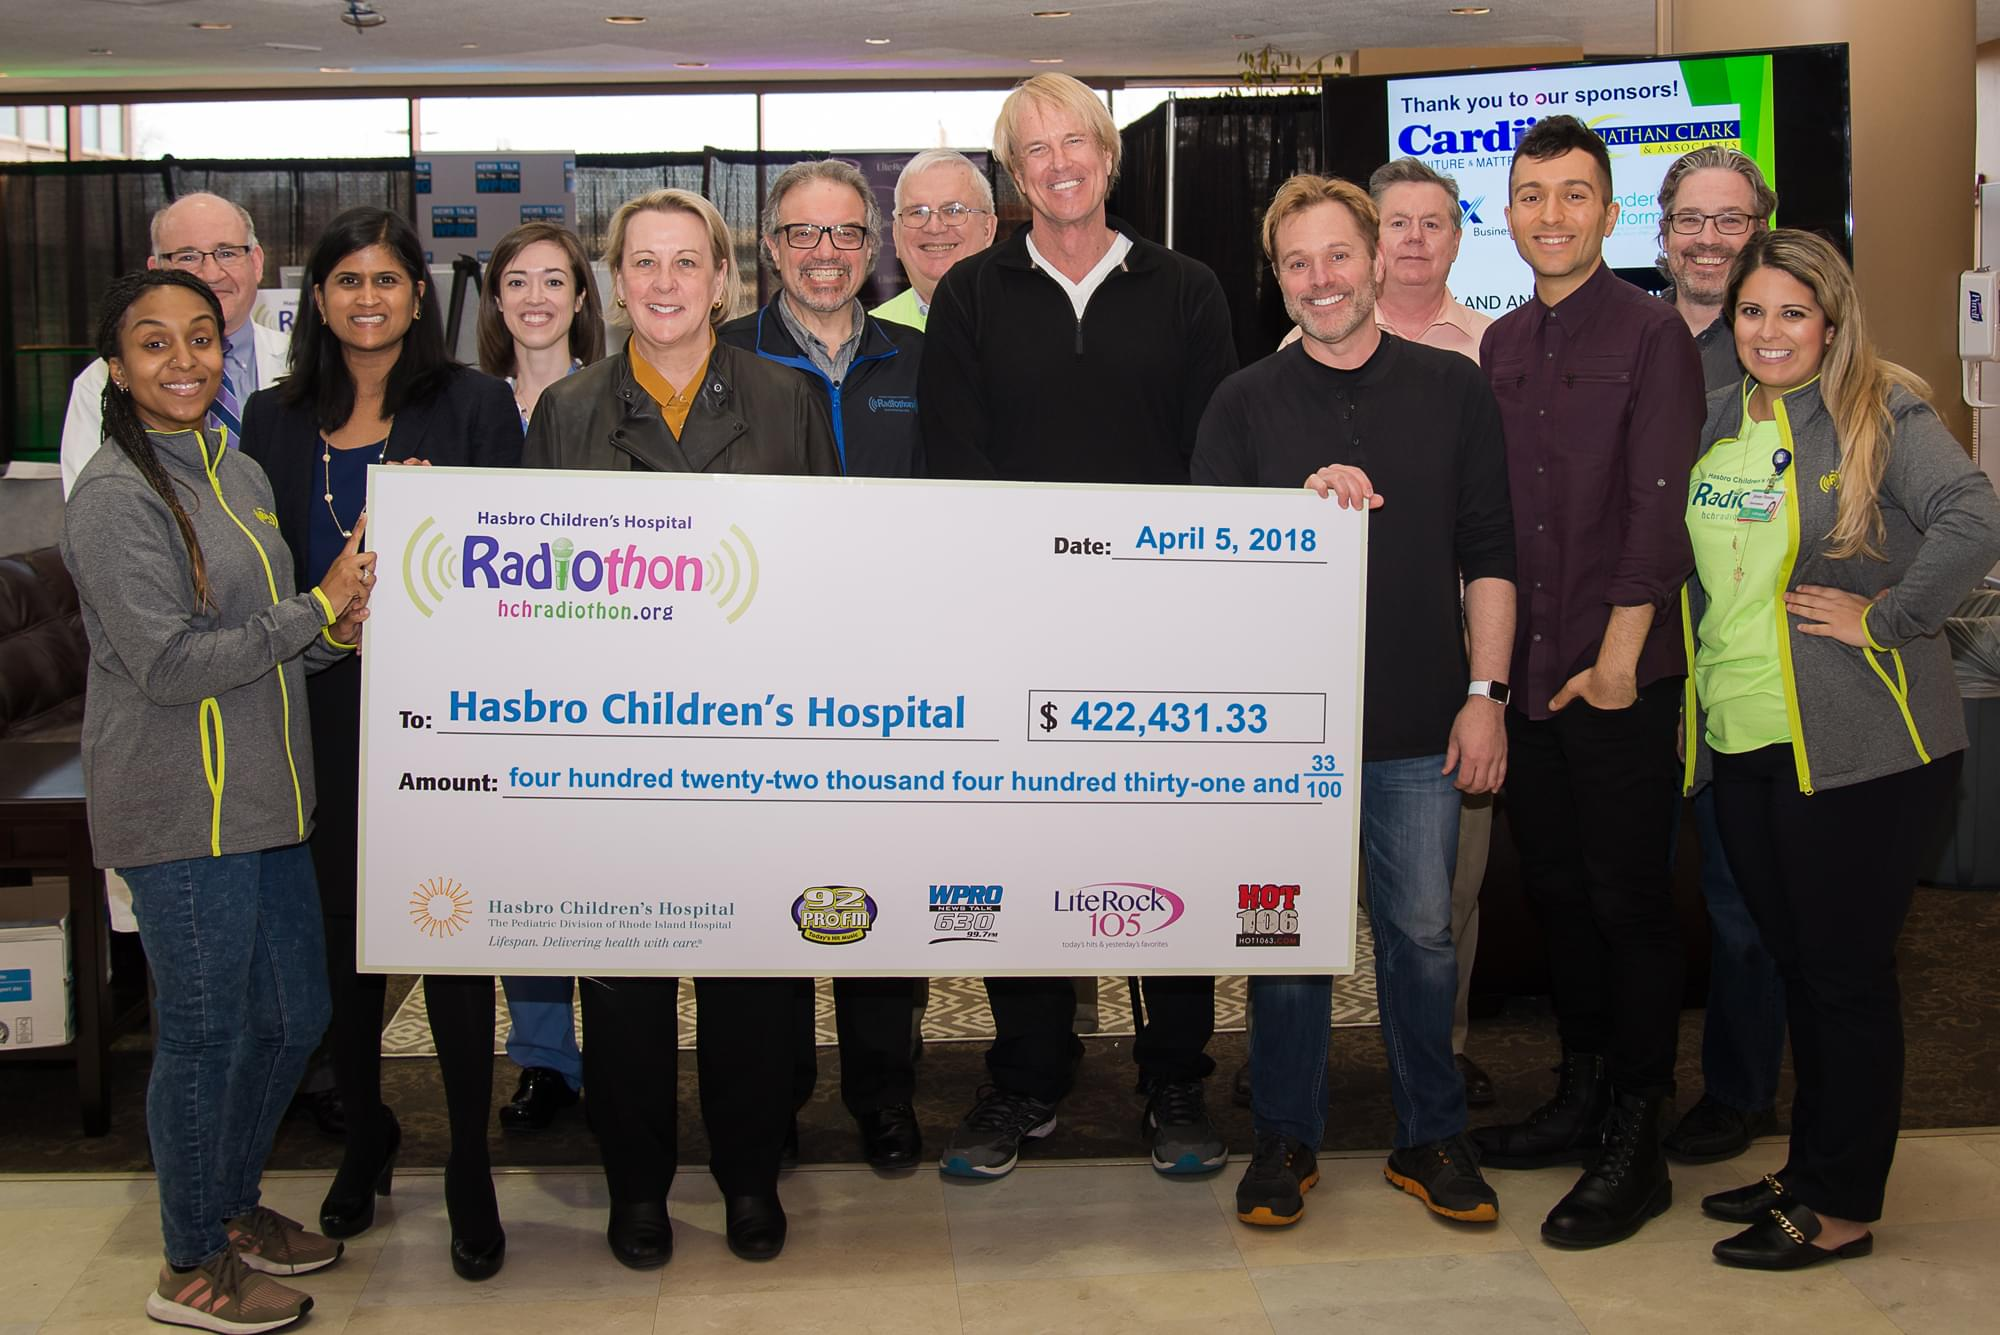 2018 Radiothon Donations Top $422,000 for Hasbro Children's Hospital